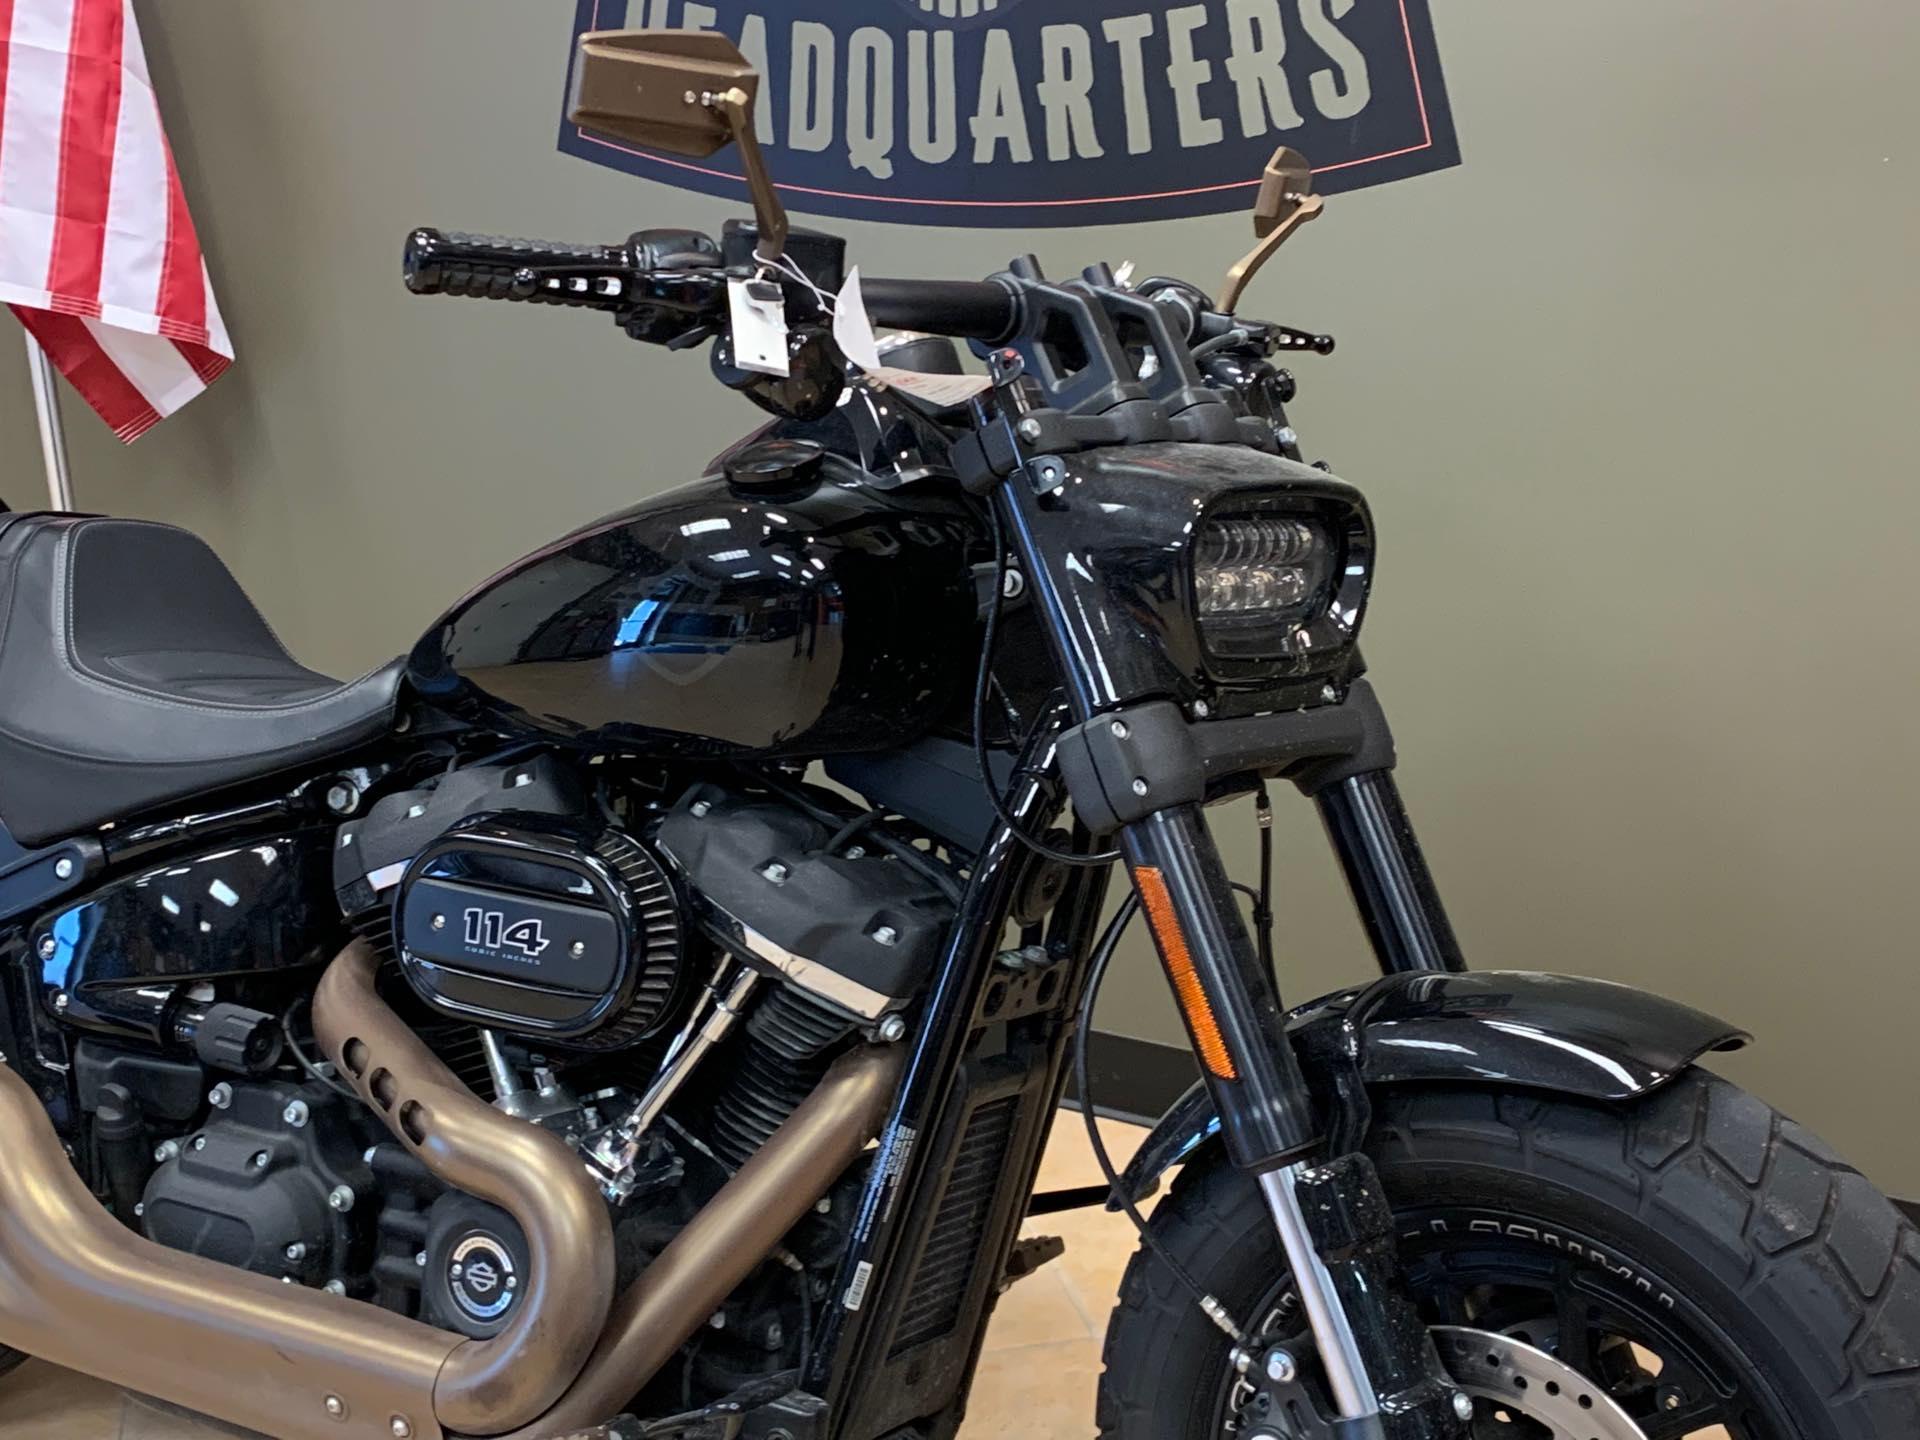 2020 Harley-Davidson Softail Fat Bob 114 at Loess Hills Harley-Davidson